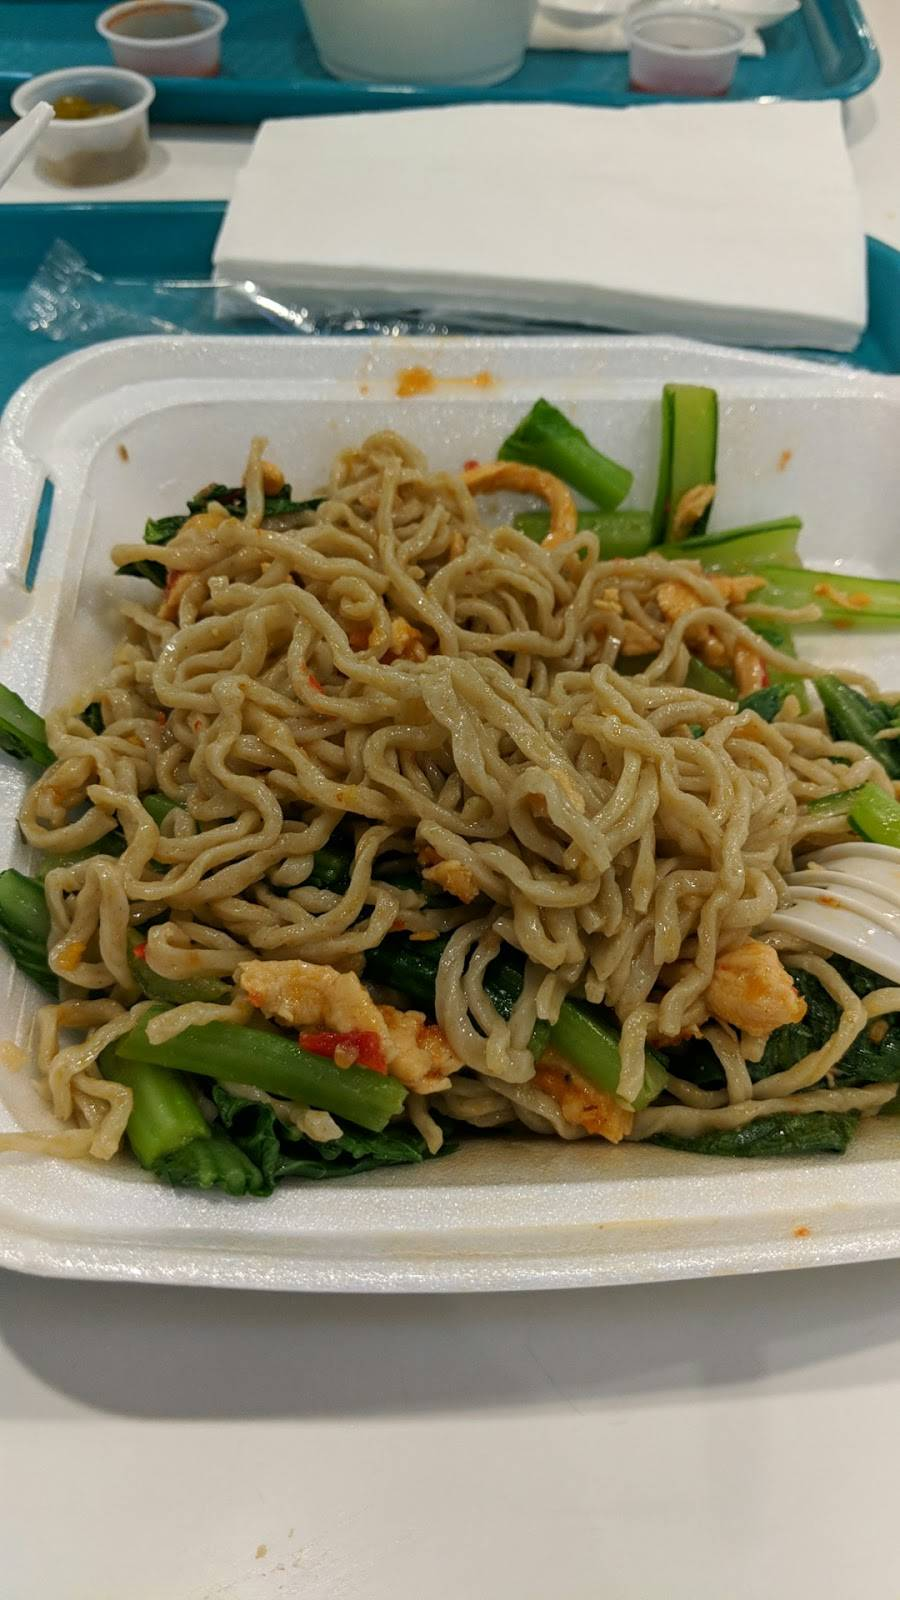 Janty Noodle | restaurant | 989 S Glendora Ave #14, West Covina, CA 91790, USA | 6264801808 OR +1 626-480-1808